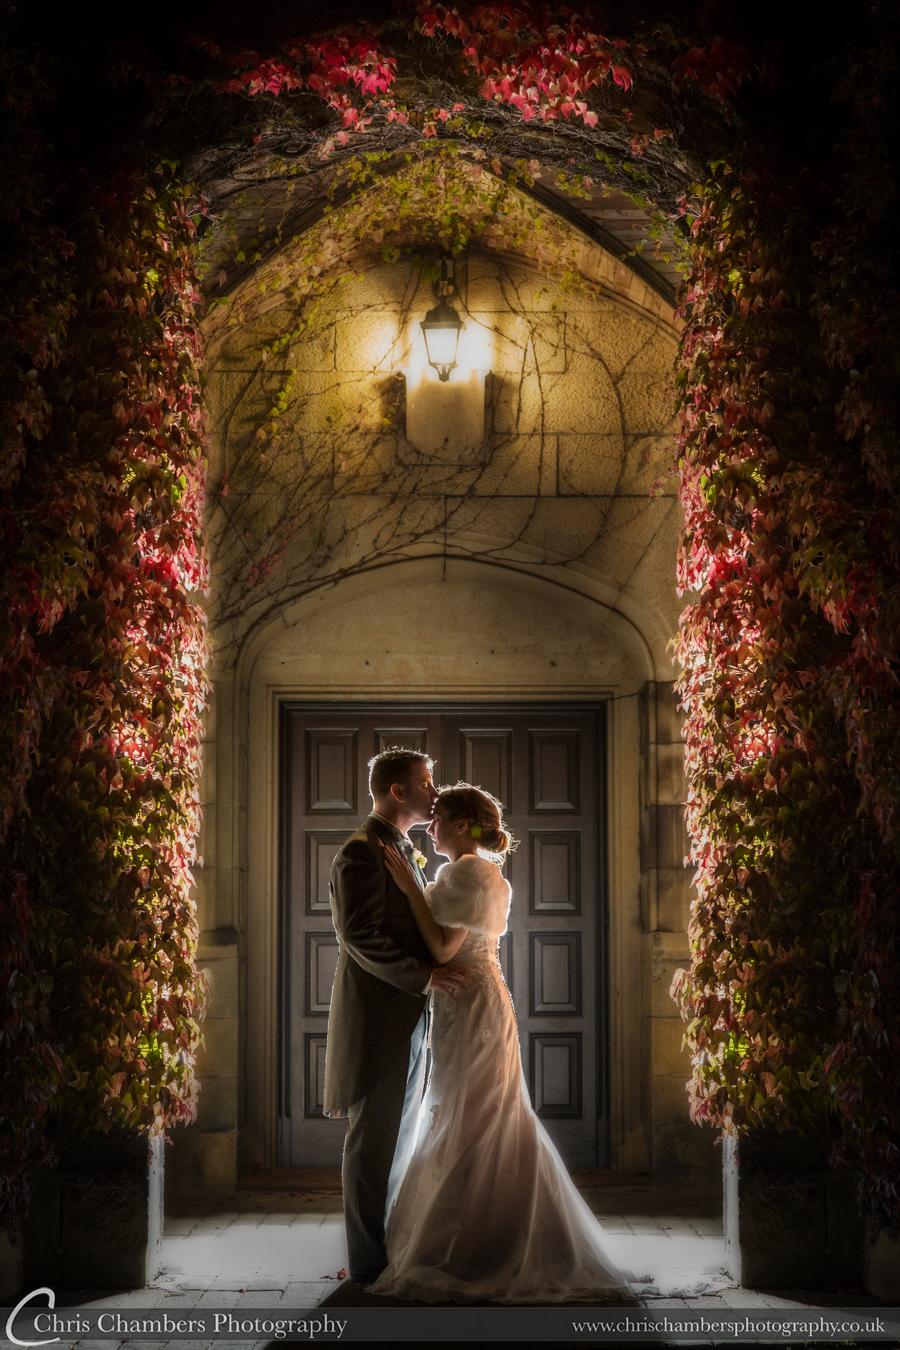 Swinton park wedding photography, north Yorkshire, award winning swinton park wedding photography